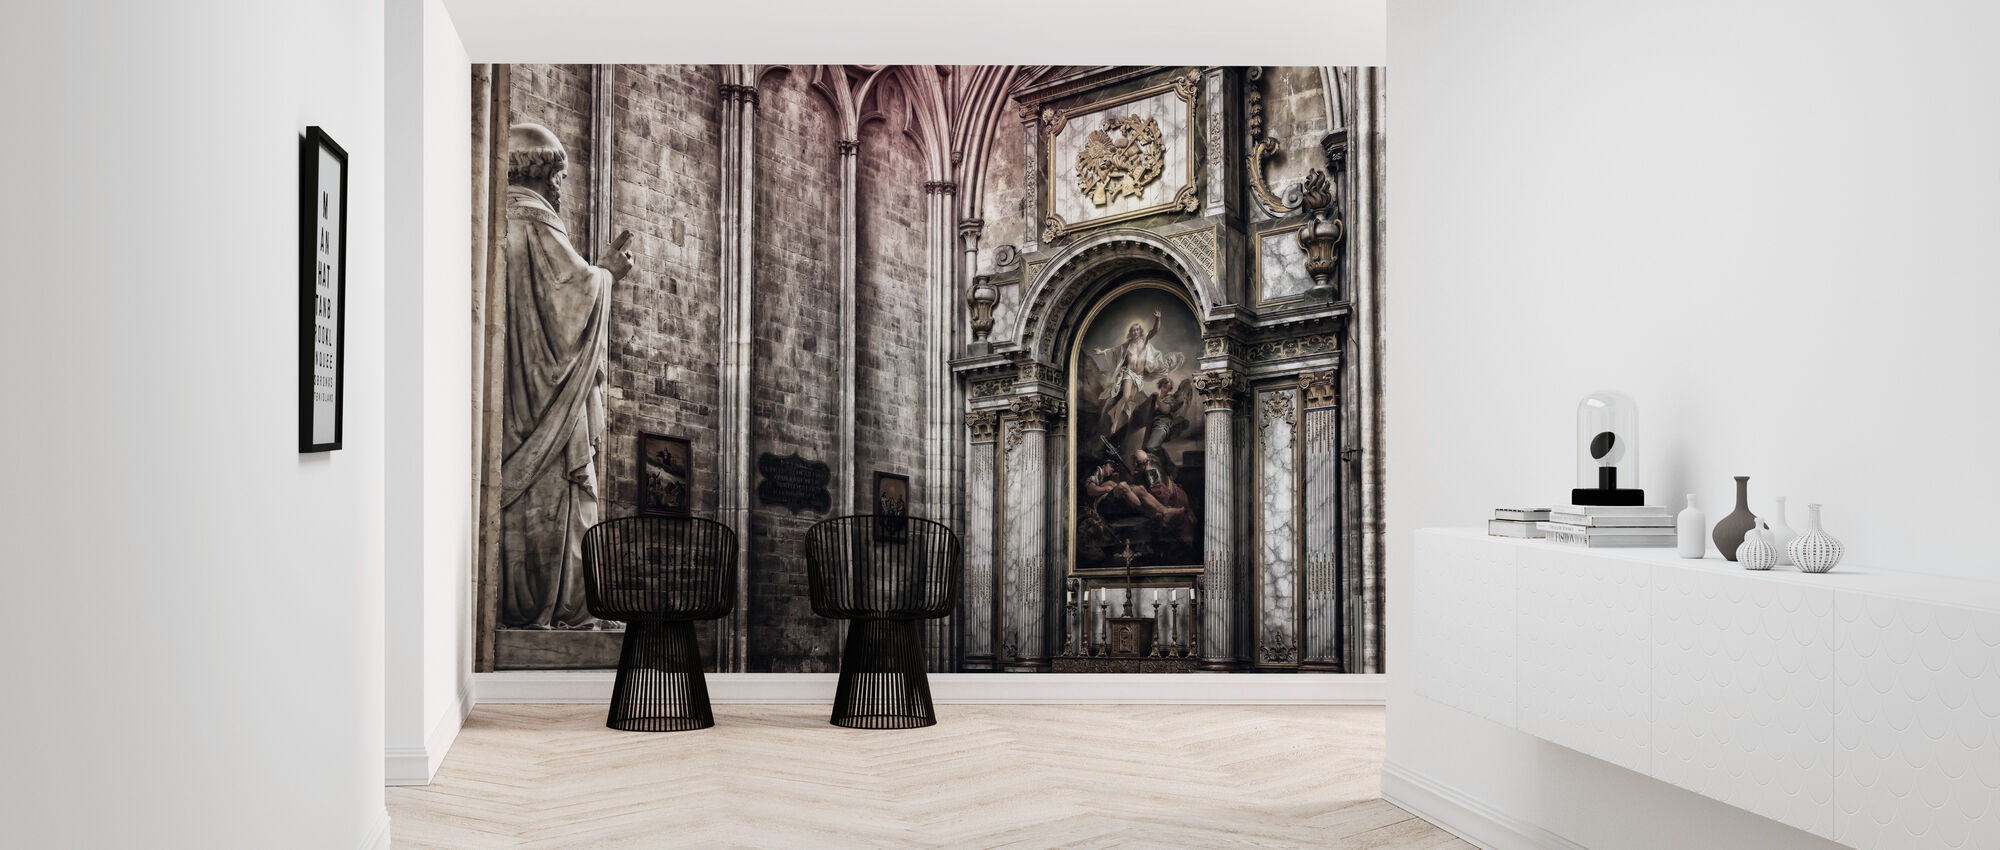 Altar - Wallpaper - Hallway